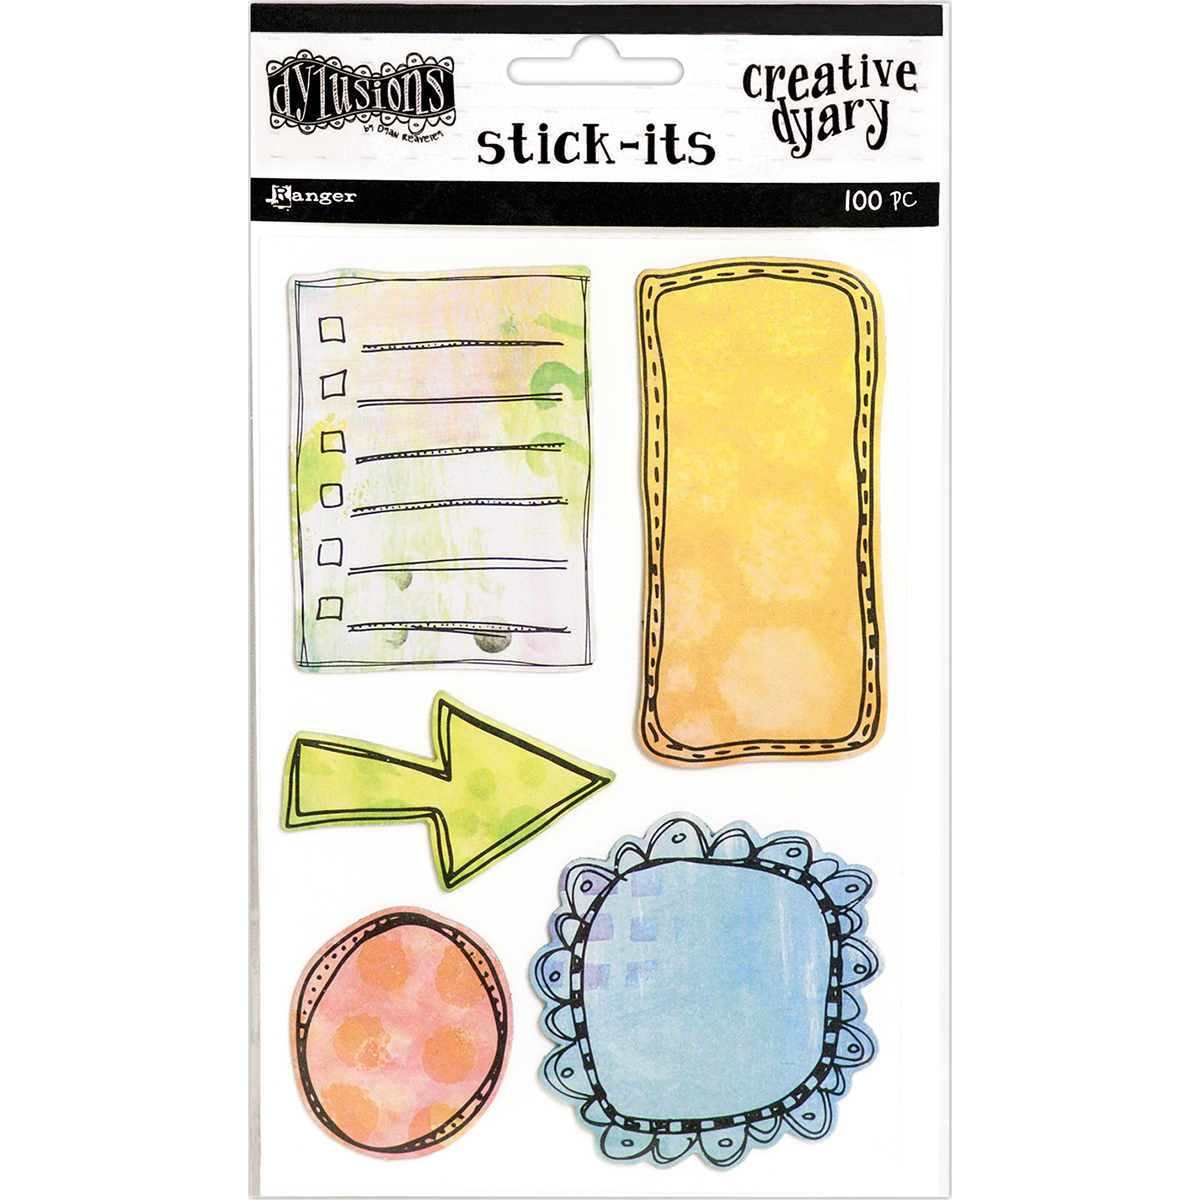 Creative Dyary Stick-its